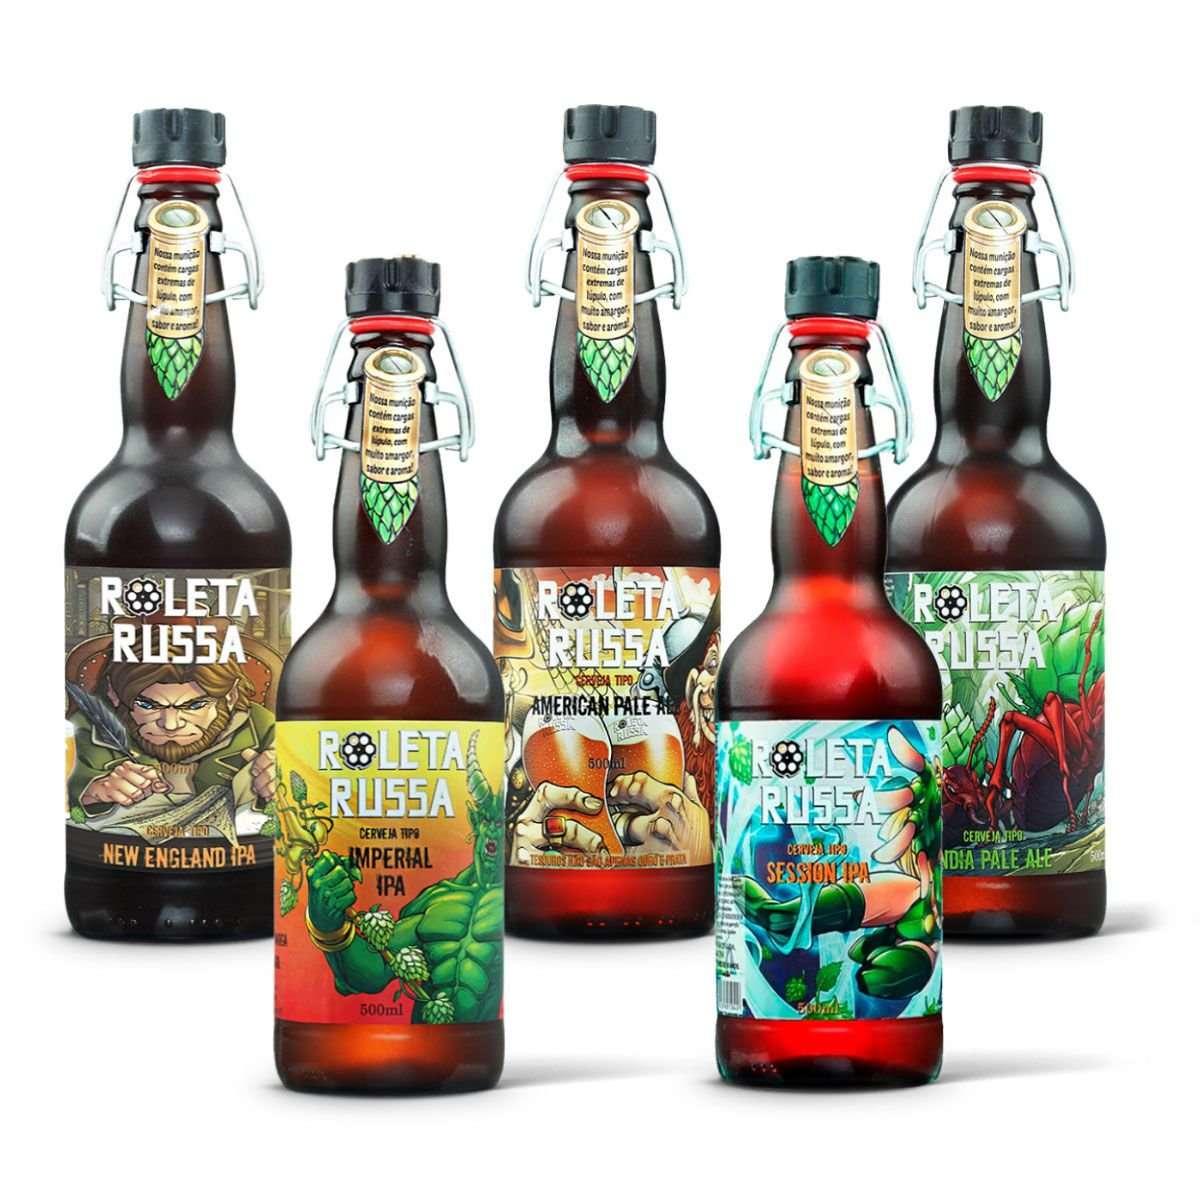 Kit Degustação – Cerveja Roleta Russa - 5 Cervejas